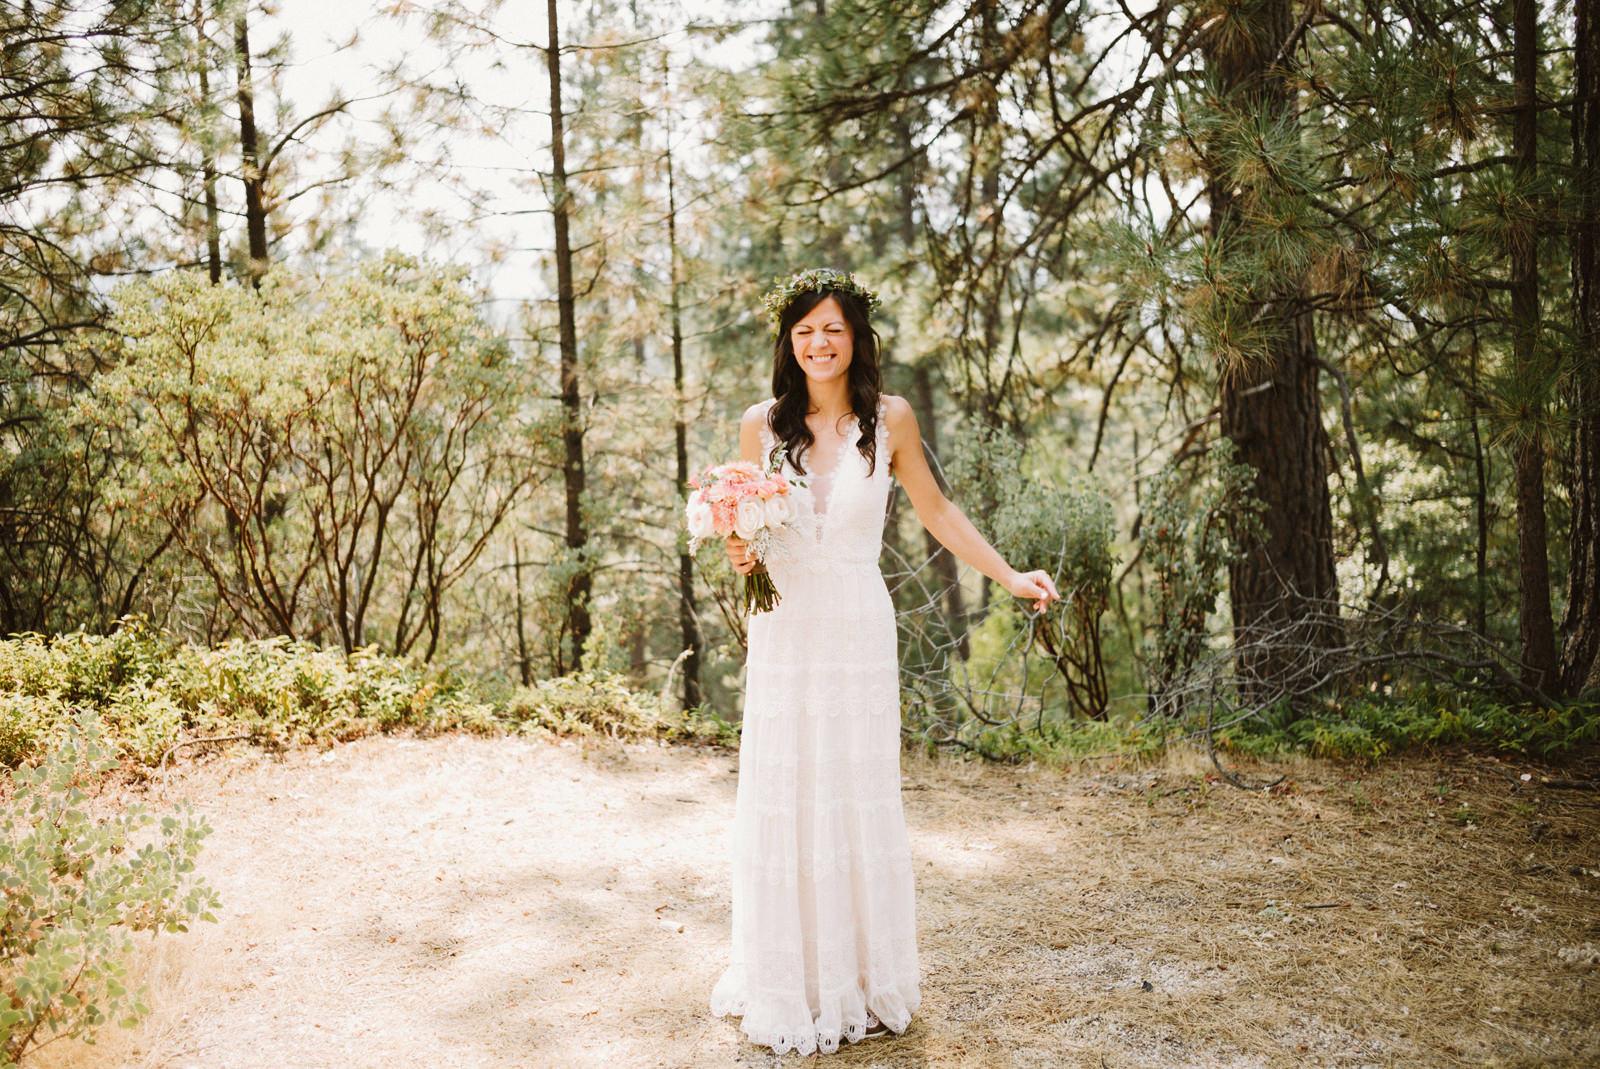 yosemite-intimate-wedding-013 YOSEMITE INTIMATE WEDDING